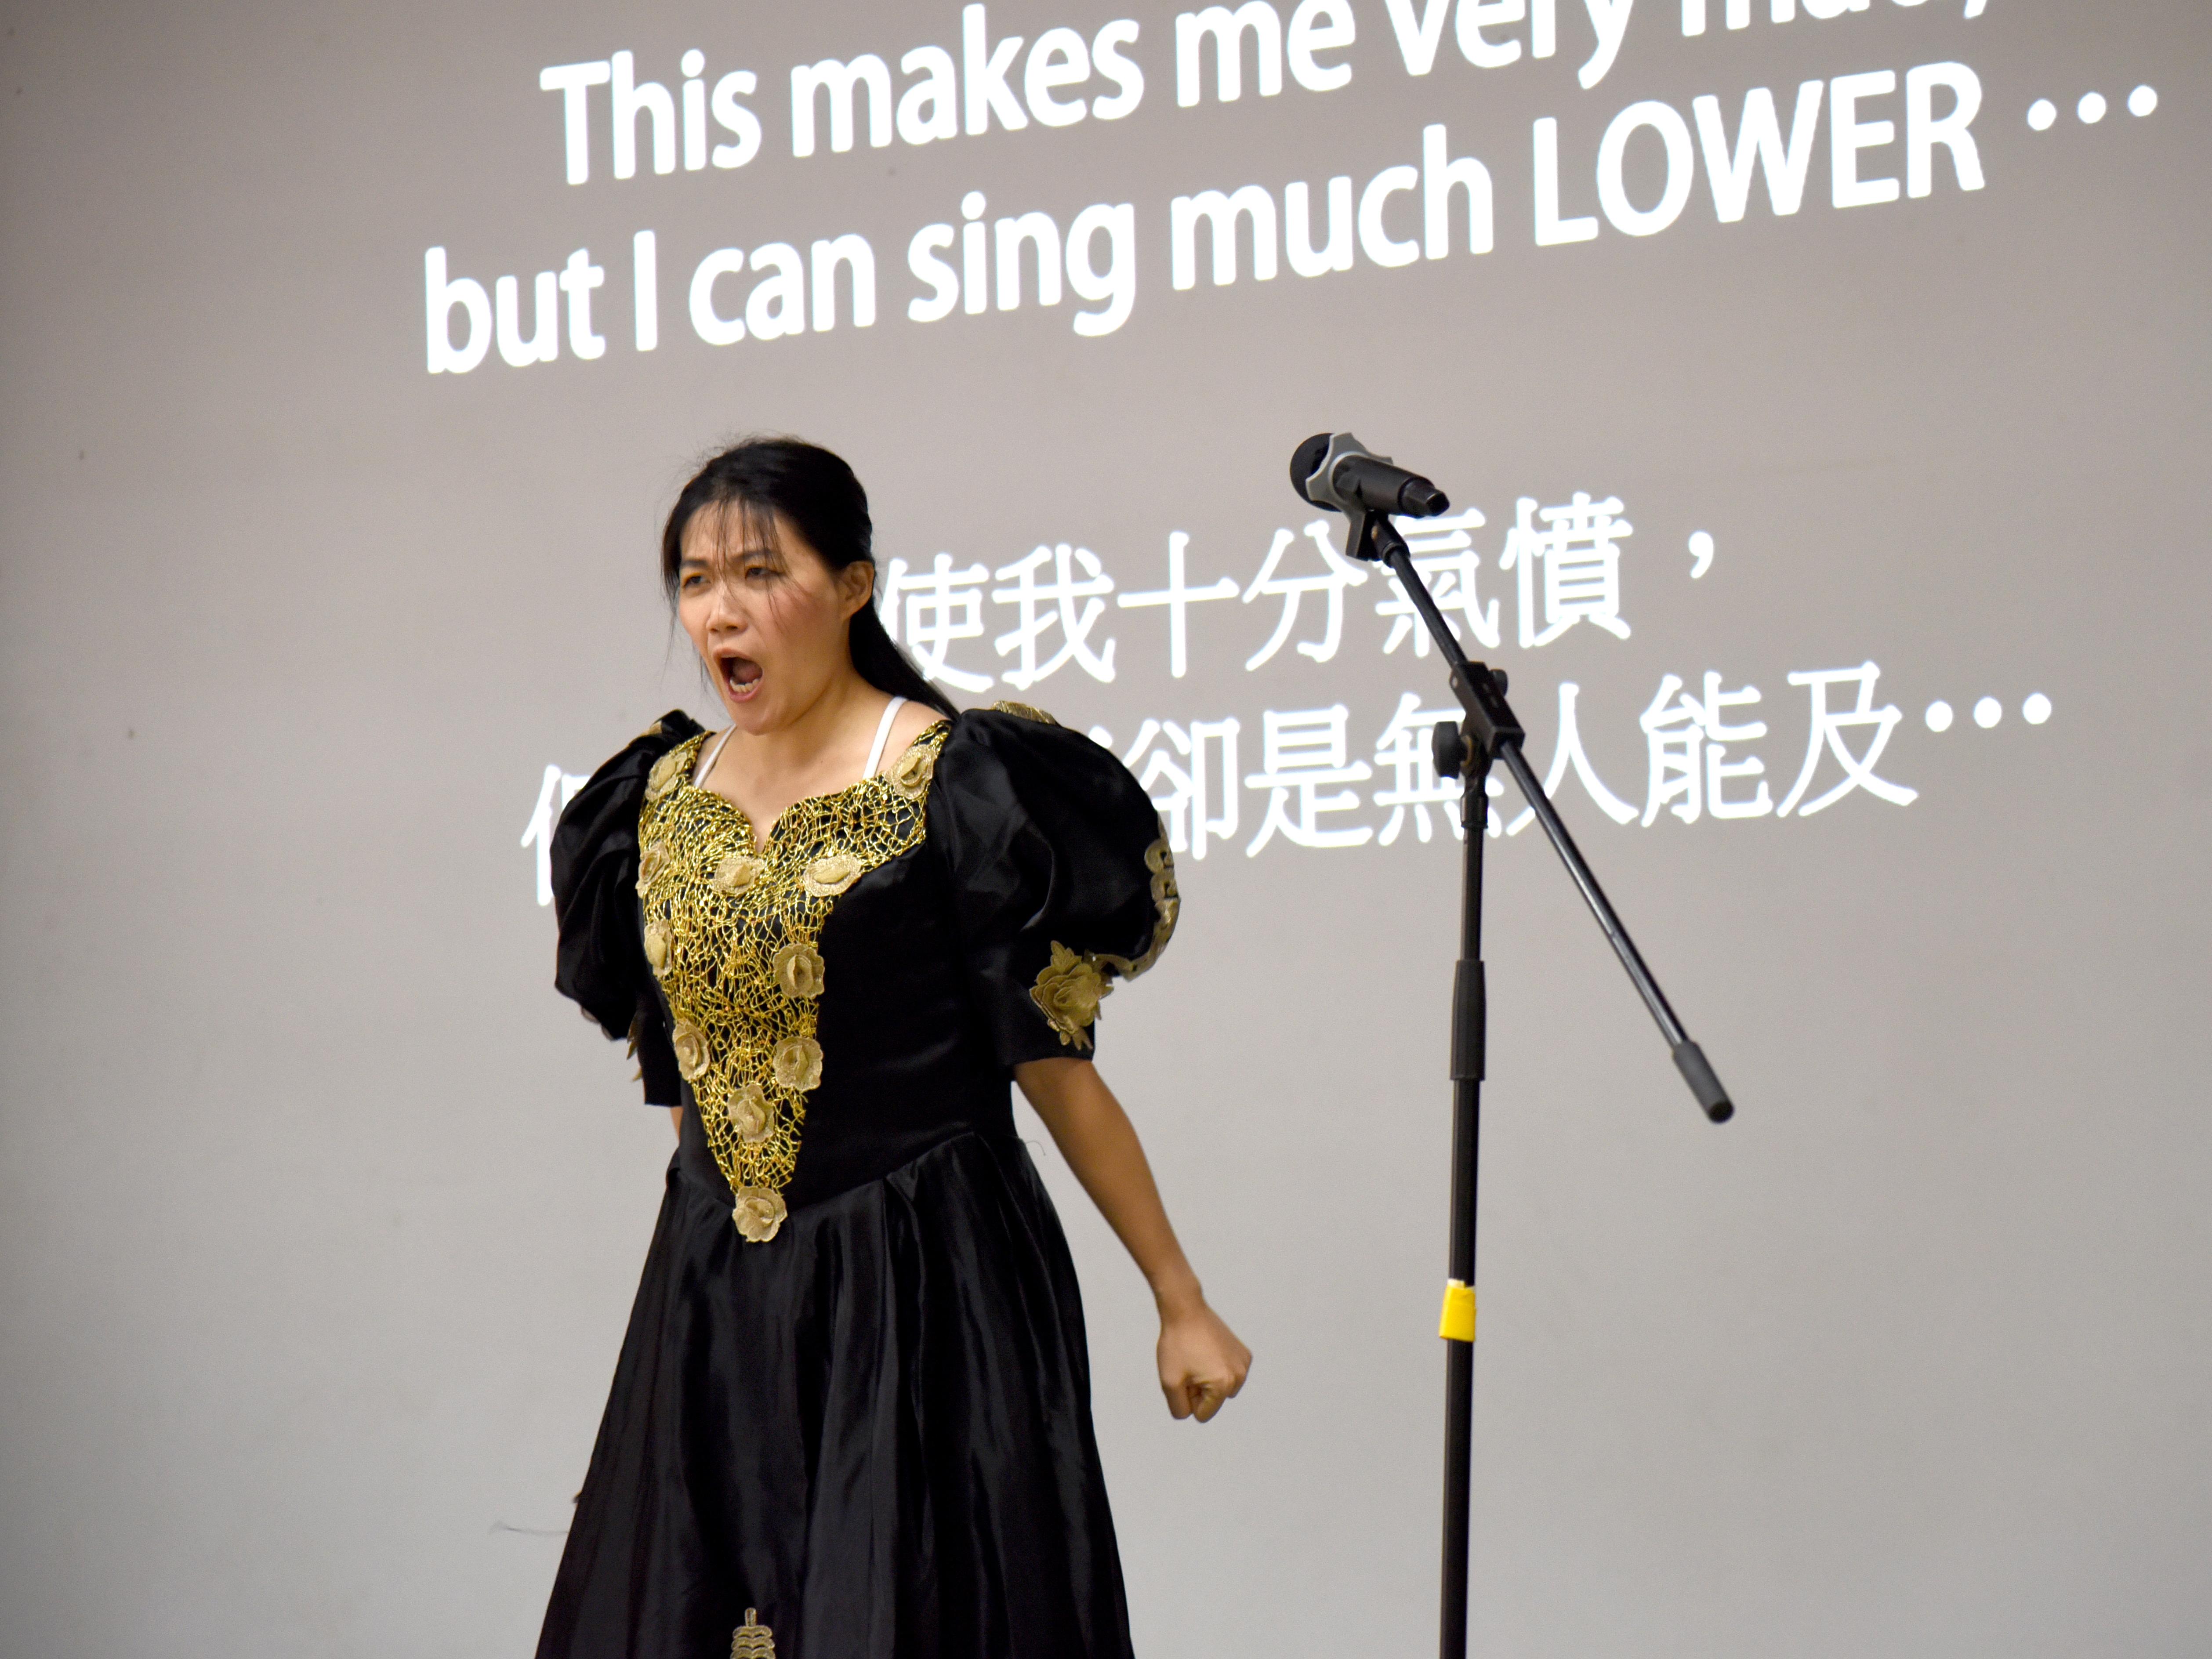 https://sfaeps.edu.hk/sites/default/files/dsc_9049.jpg